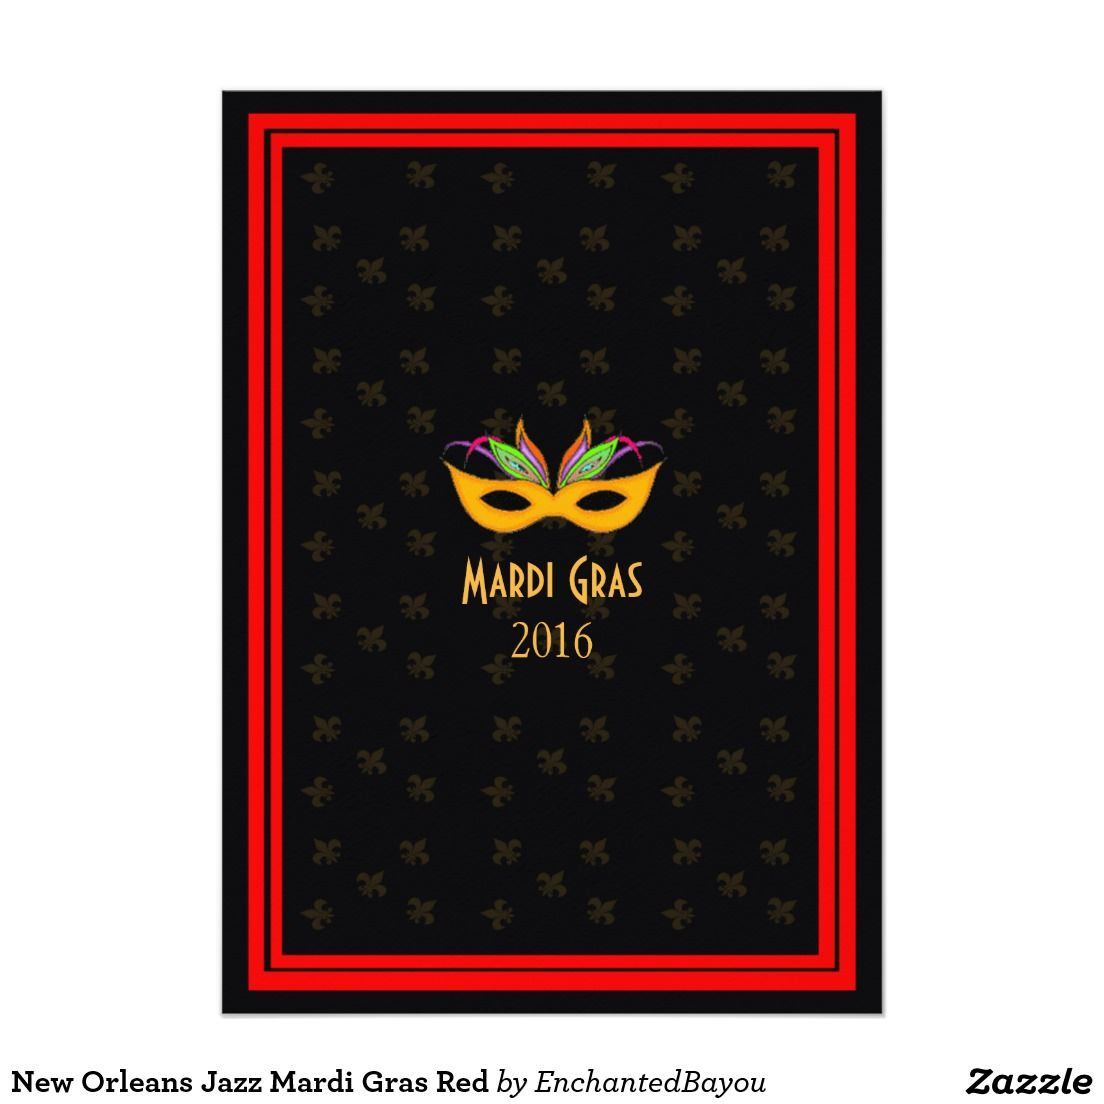 Modern Mardi Gras Party Invites Illustration - Invitations and ...